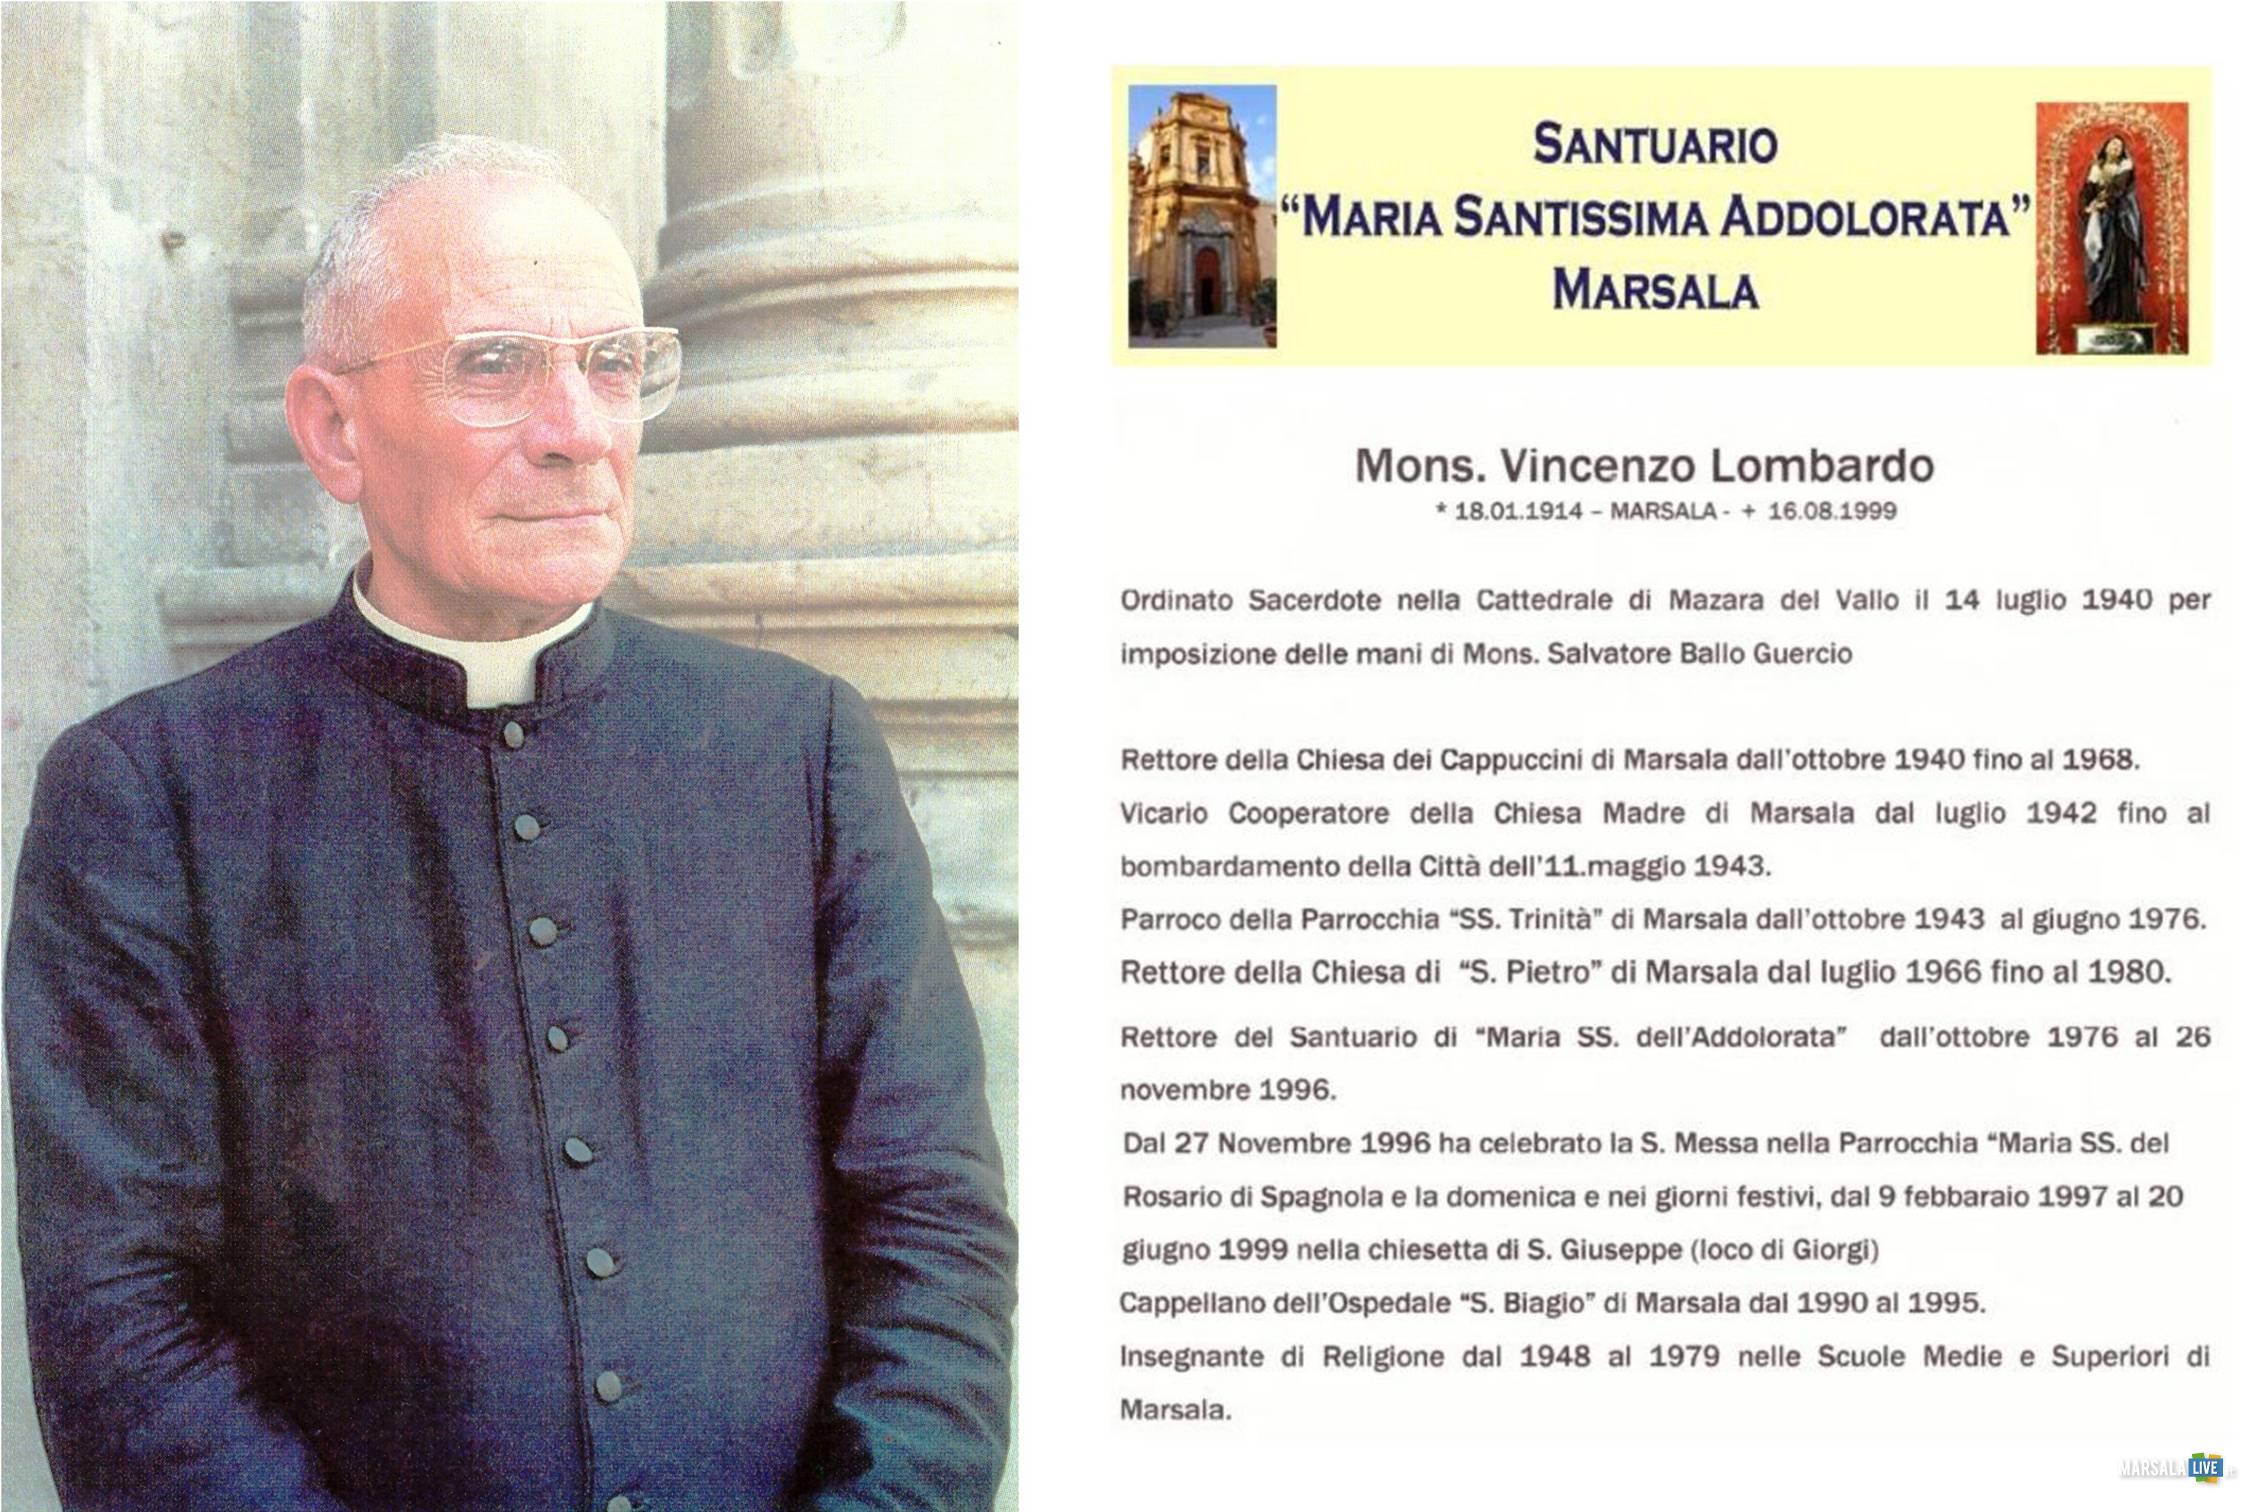 Marsala, ricordato mons. Vincenzo Lombardo